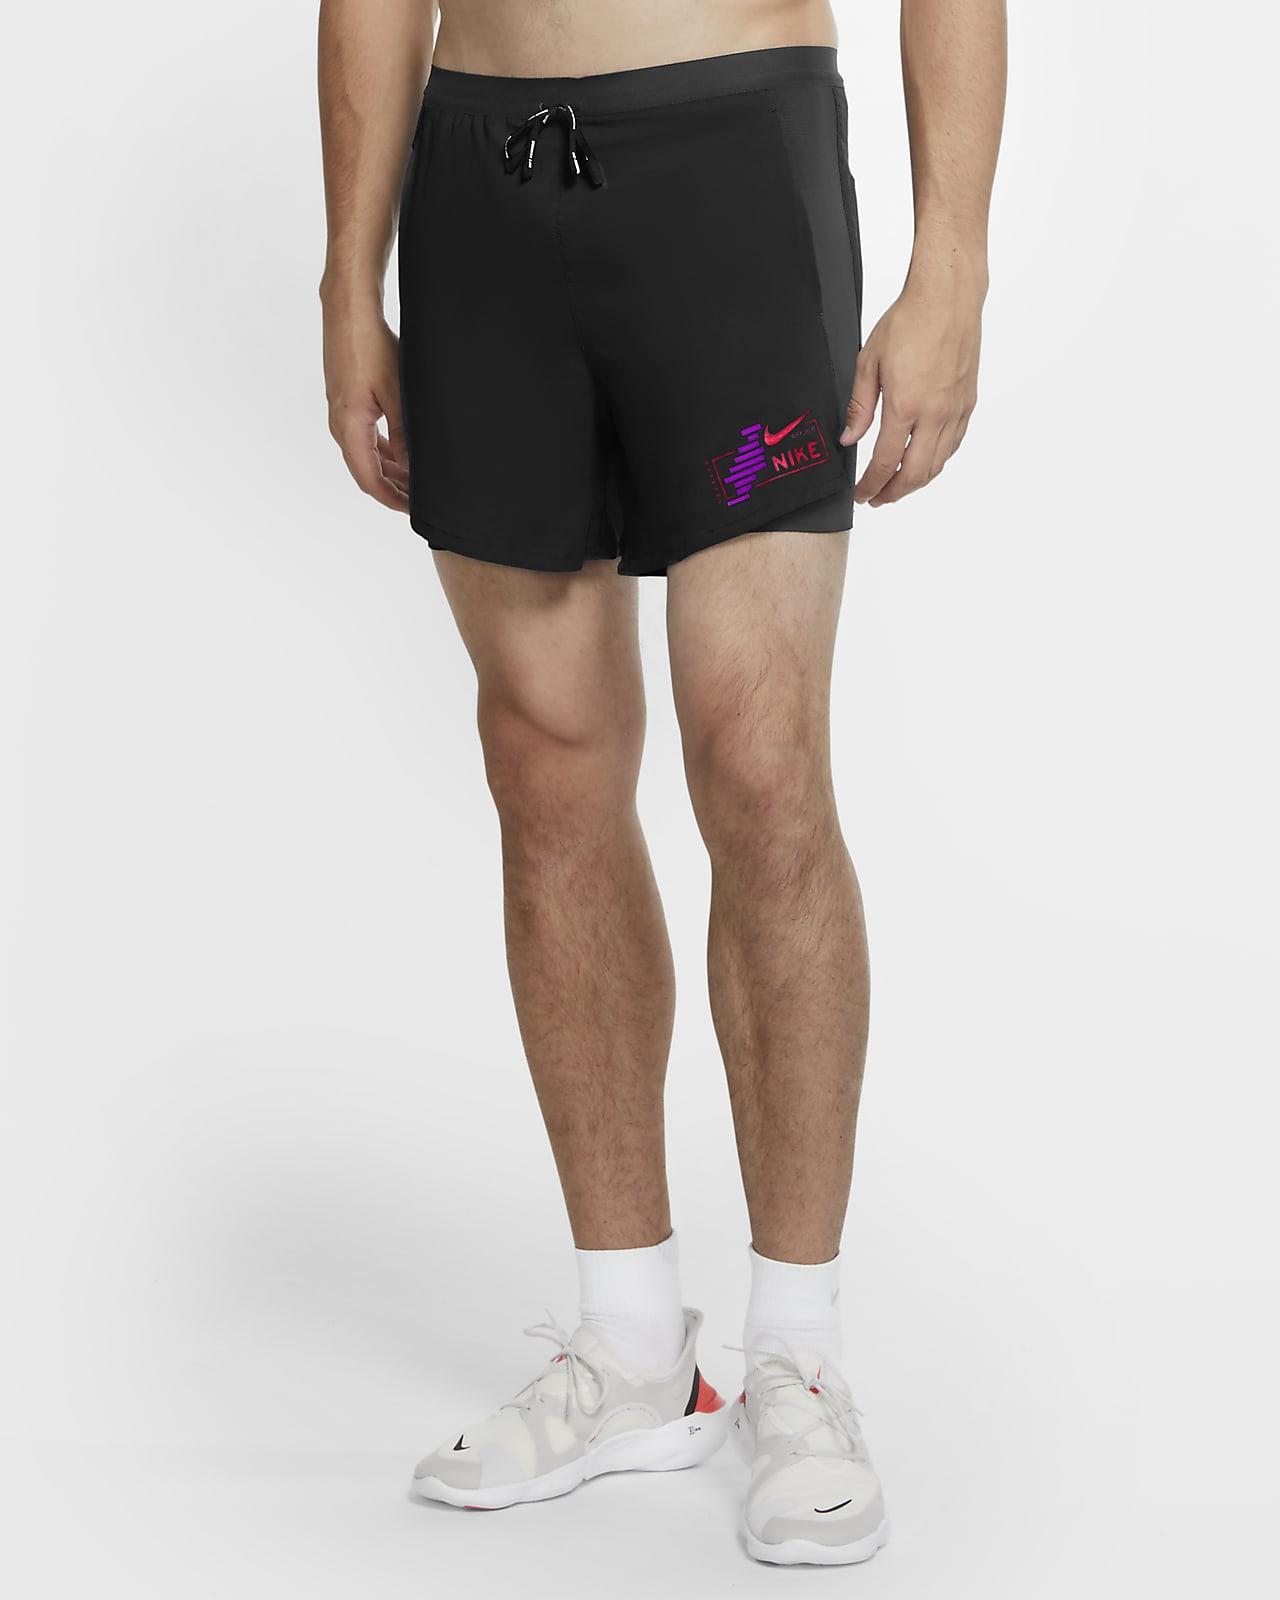 Shorts de running para hombre 2-en-1 Nike Flex Stride Future Fast